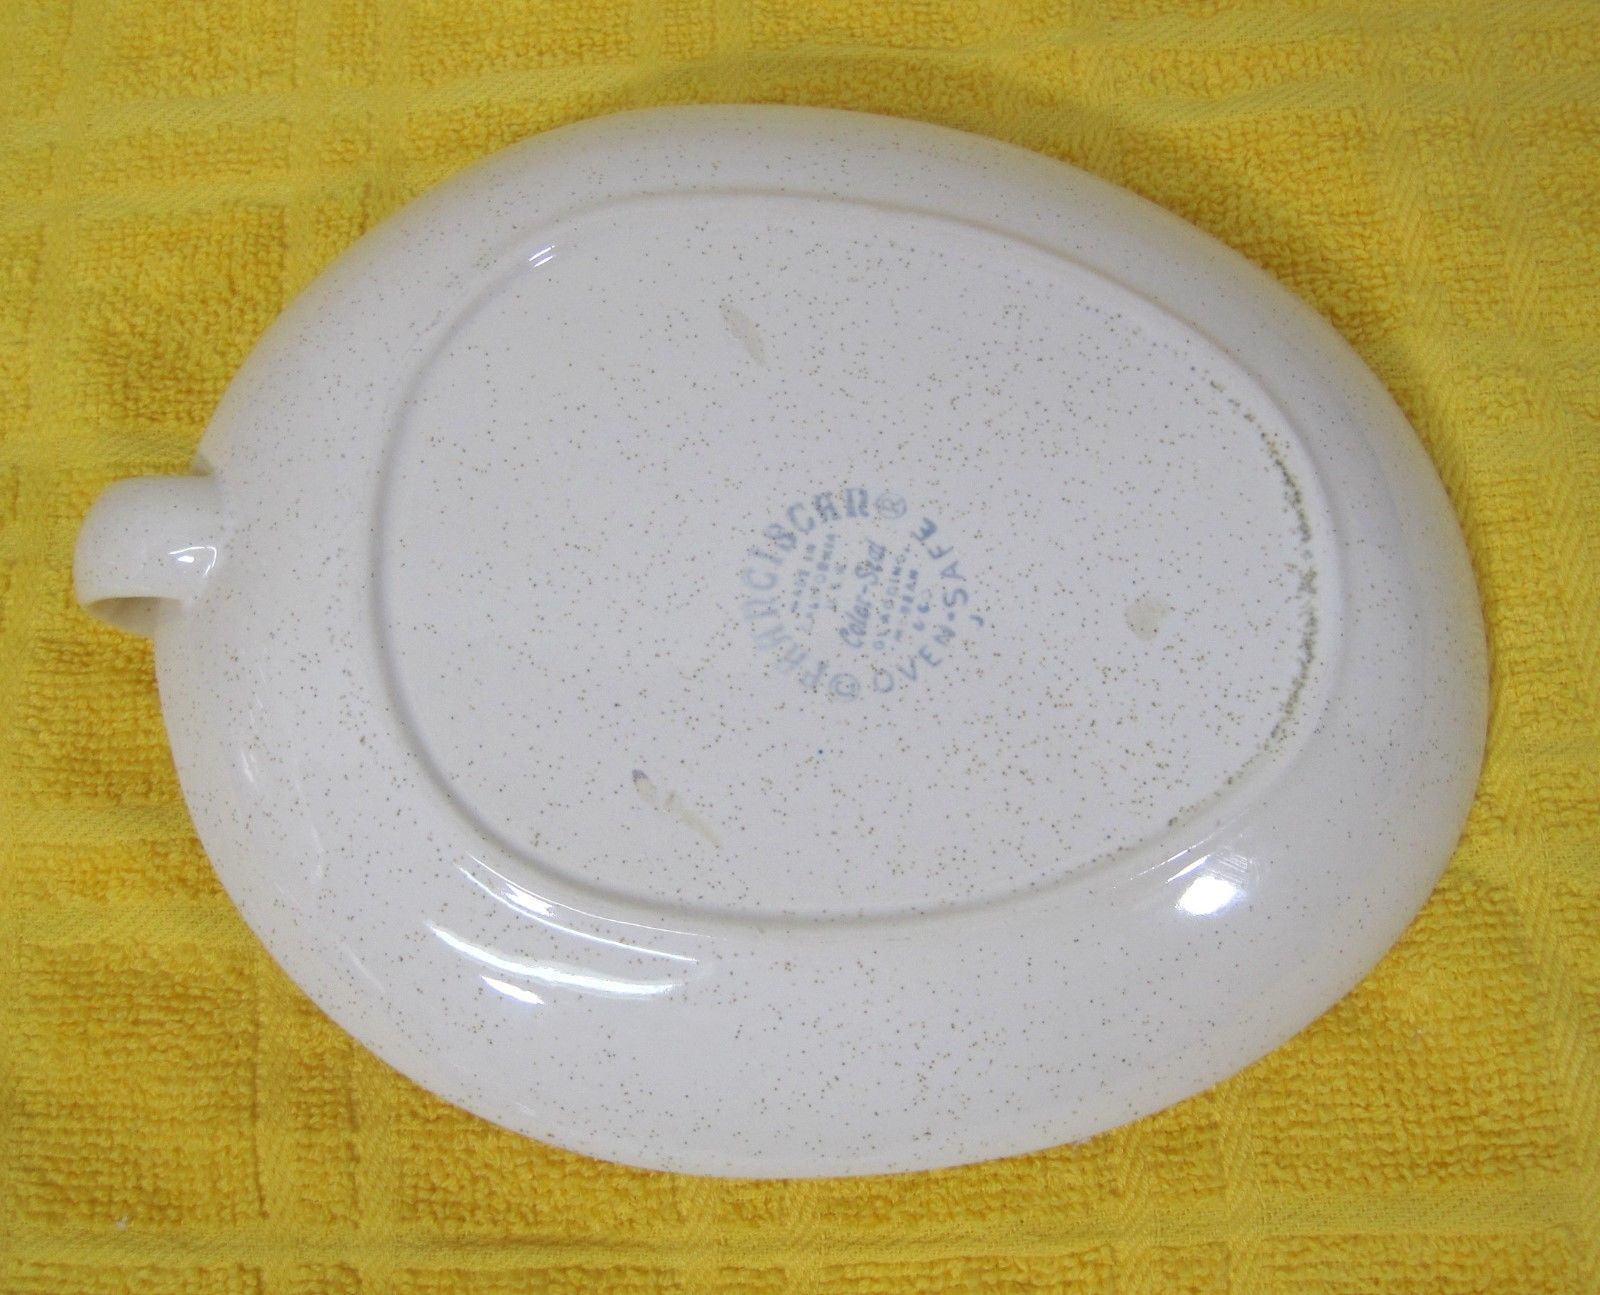 Franciscan Duet 1956-1961 Open Jam Plate Dish w Finger Hold Pink Rose Design